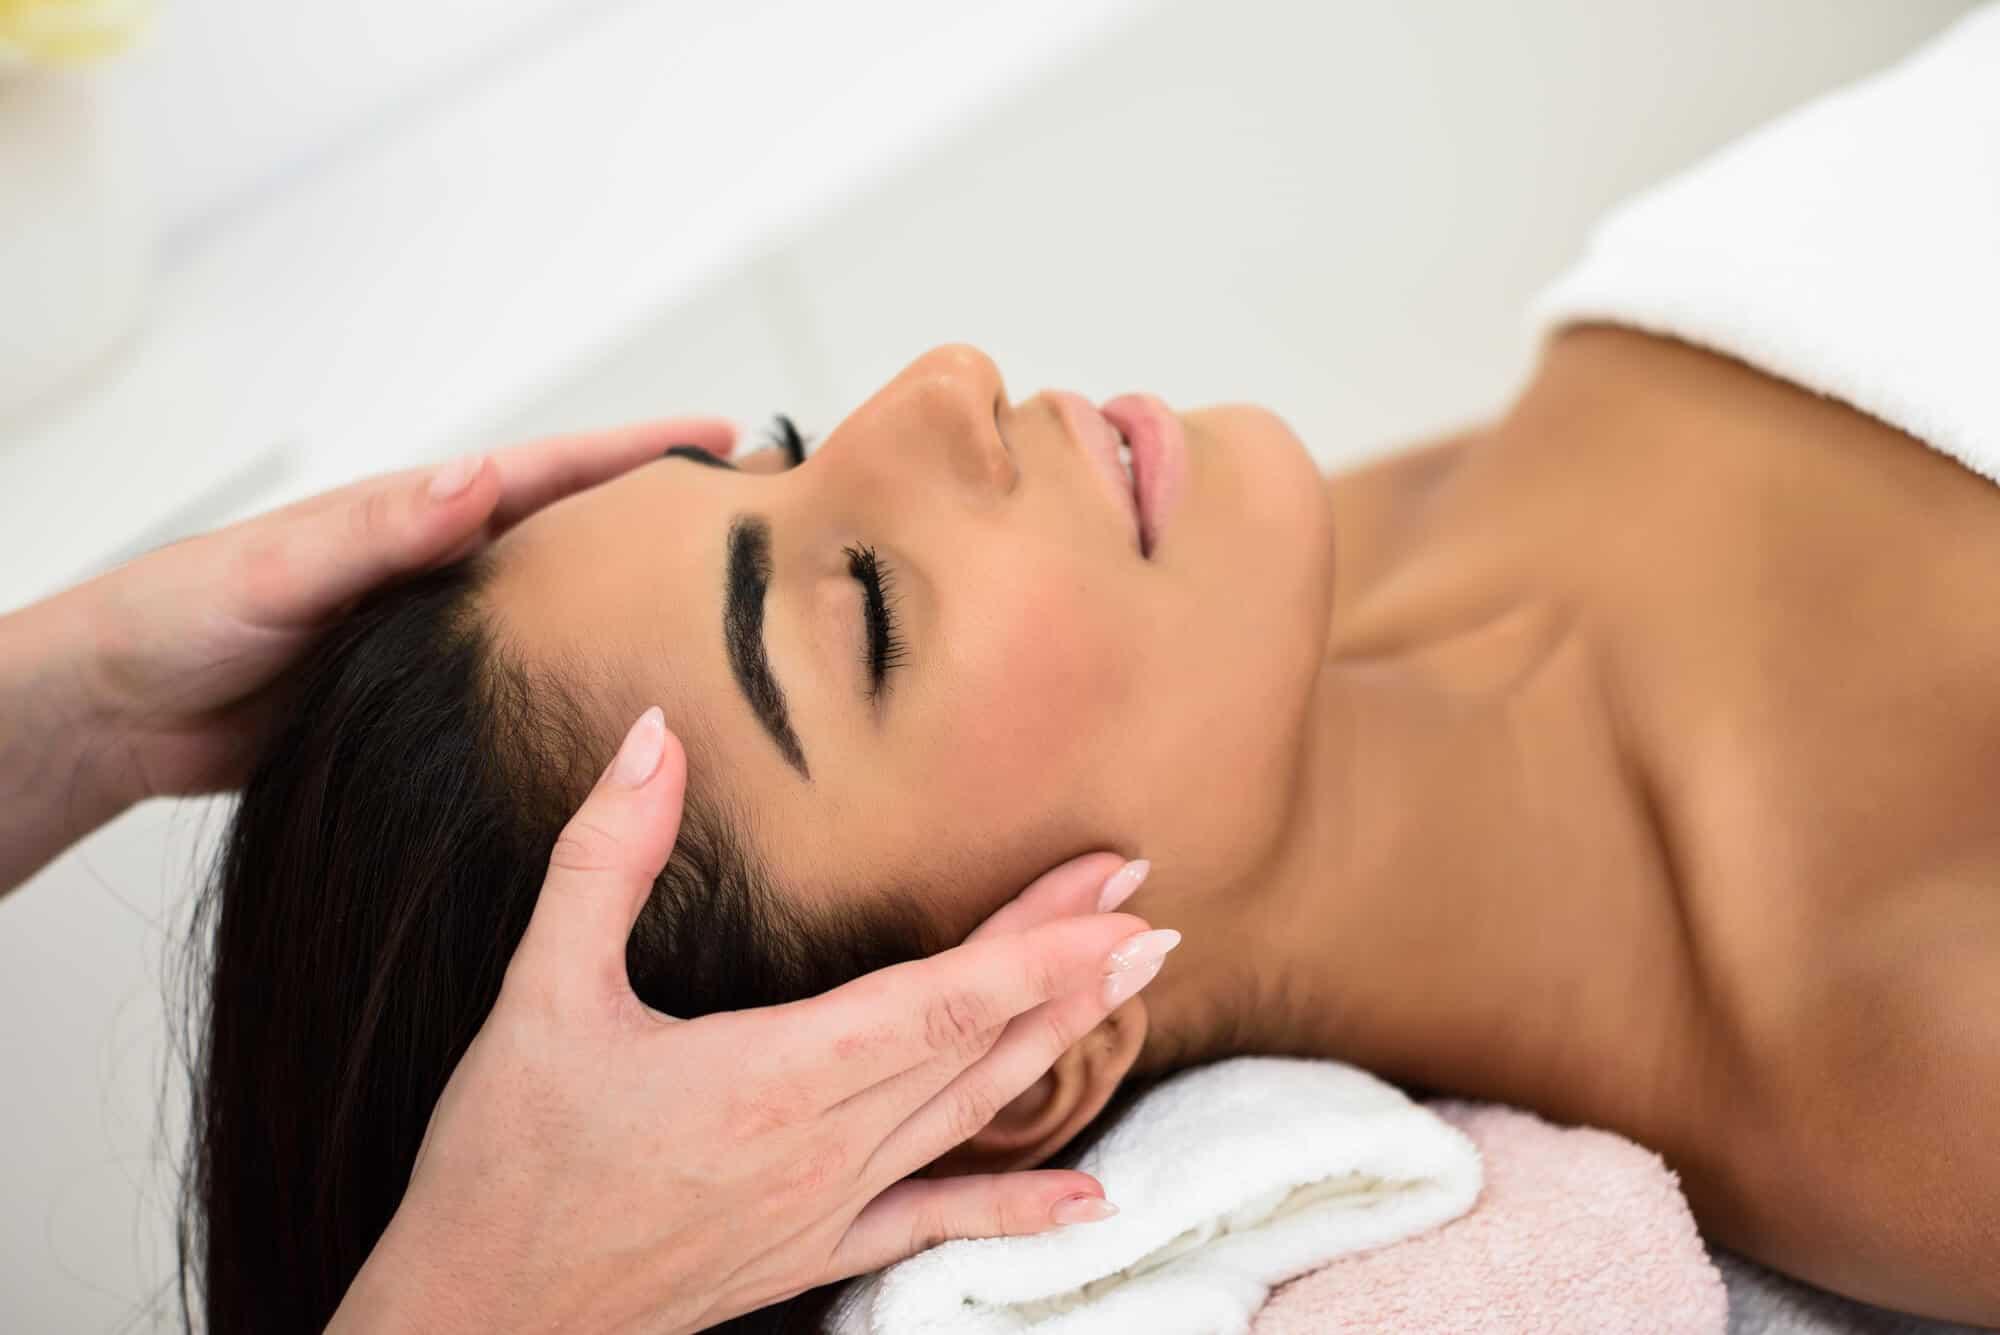 woman getting an Indian head massage